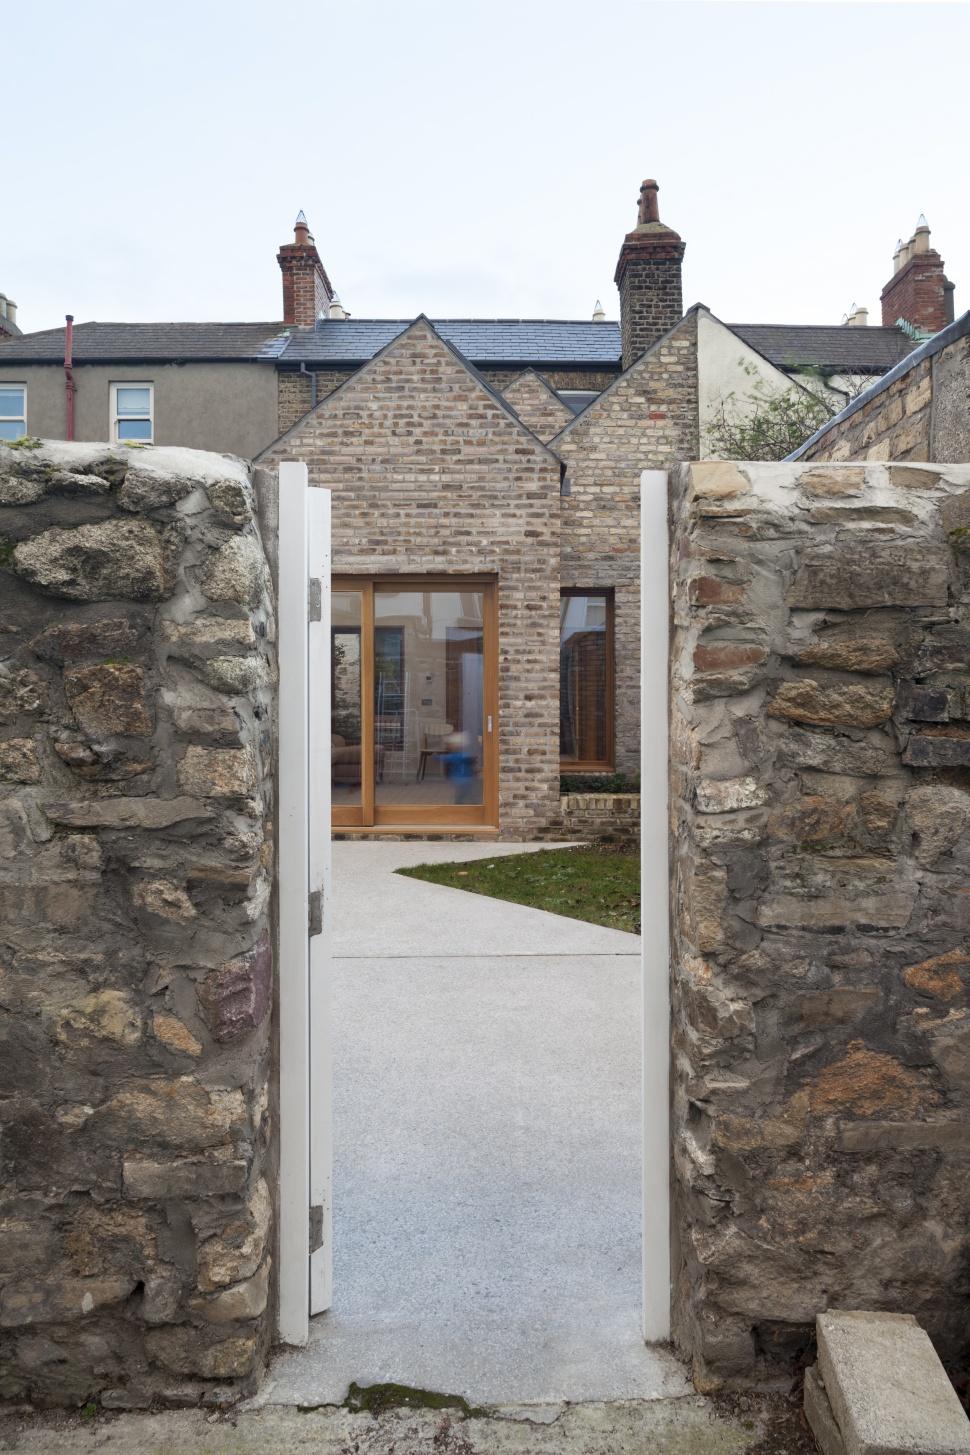 portobello renovation dublin projects john mclaughlin architects